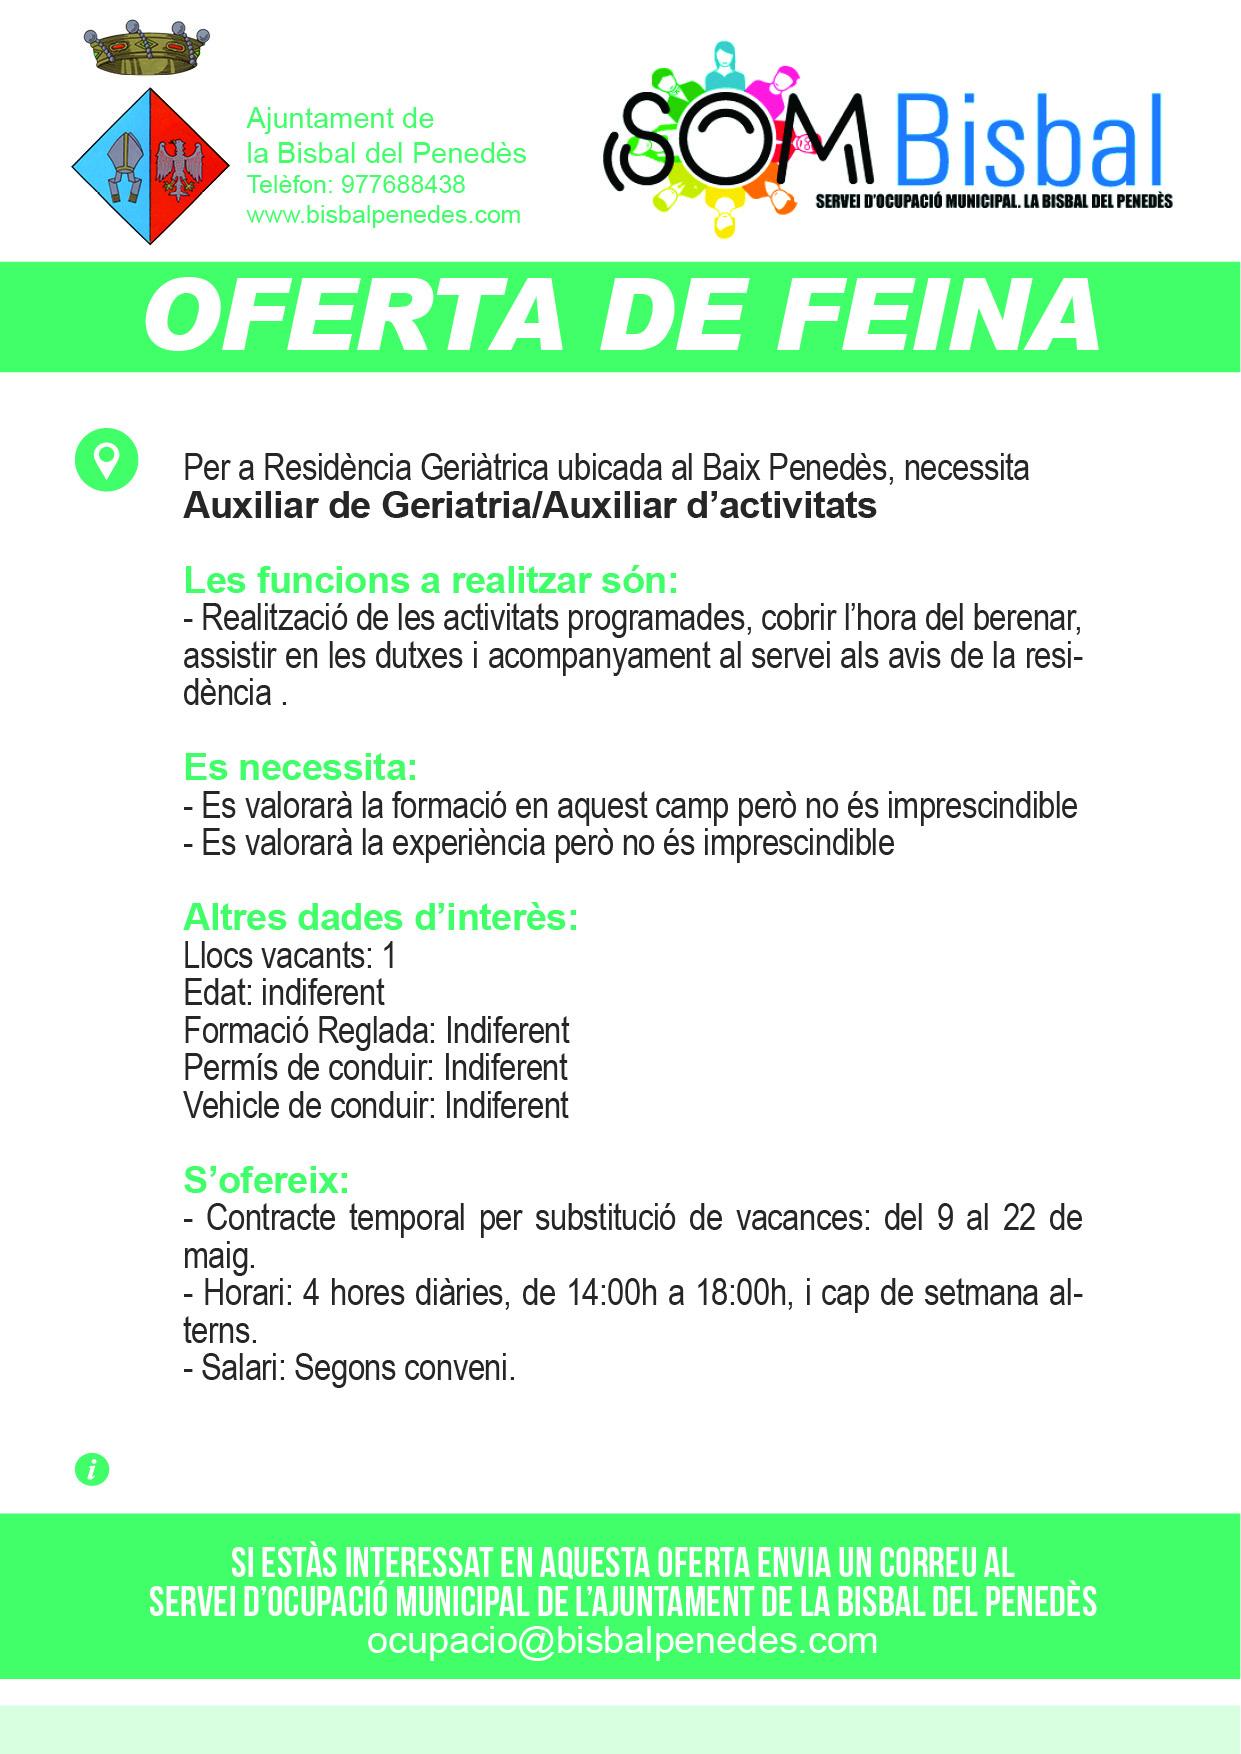 Oferta de feina. Auxiliar de Geriatria/Auxiliar d'activitats